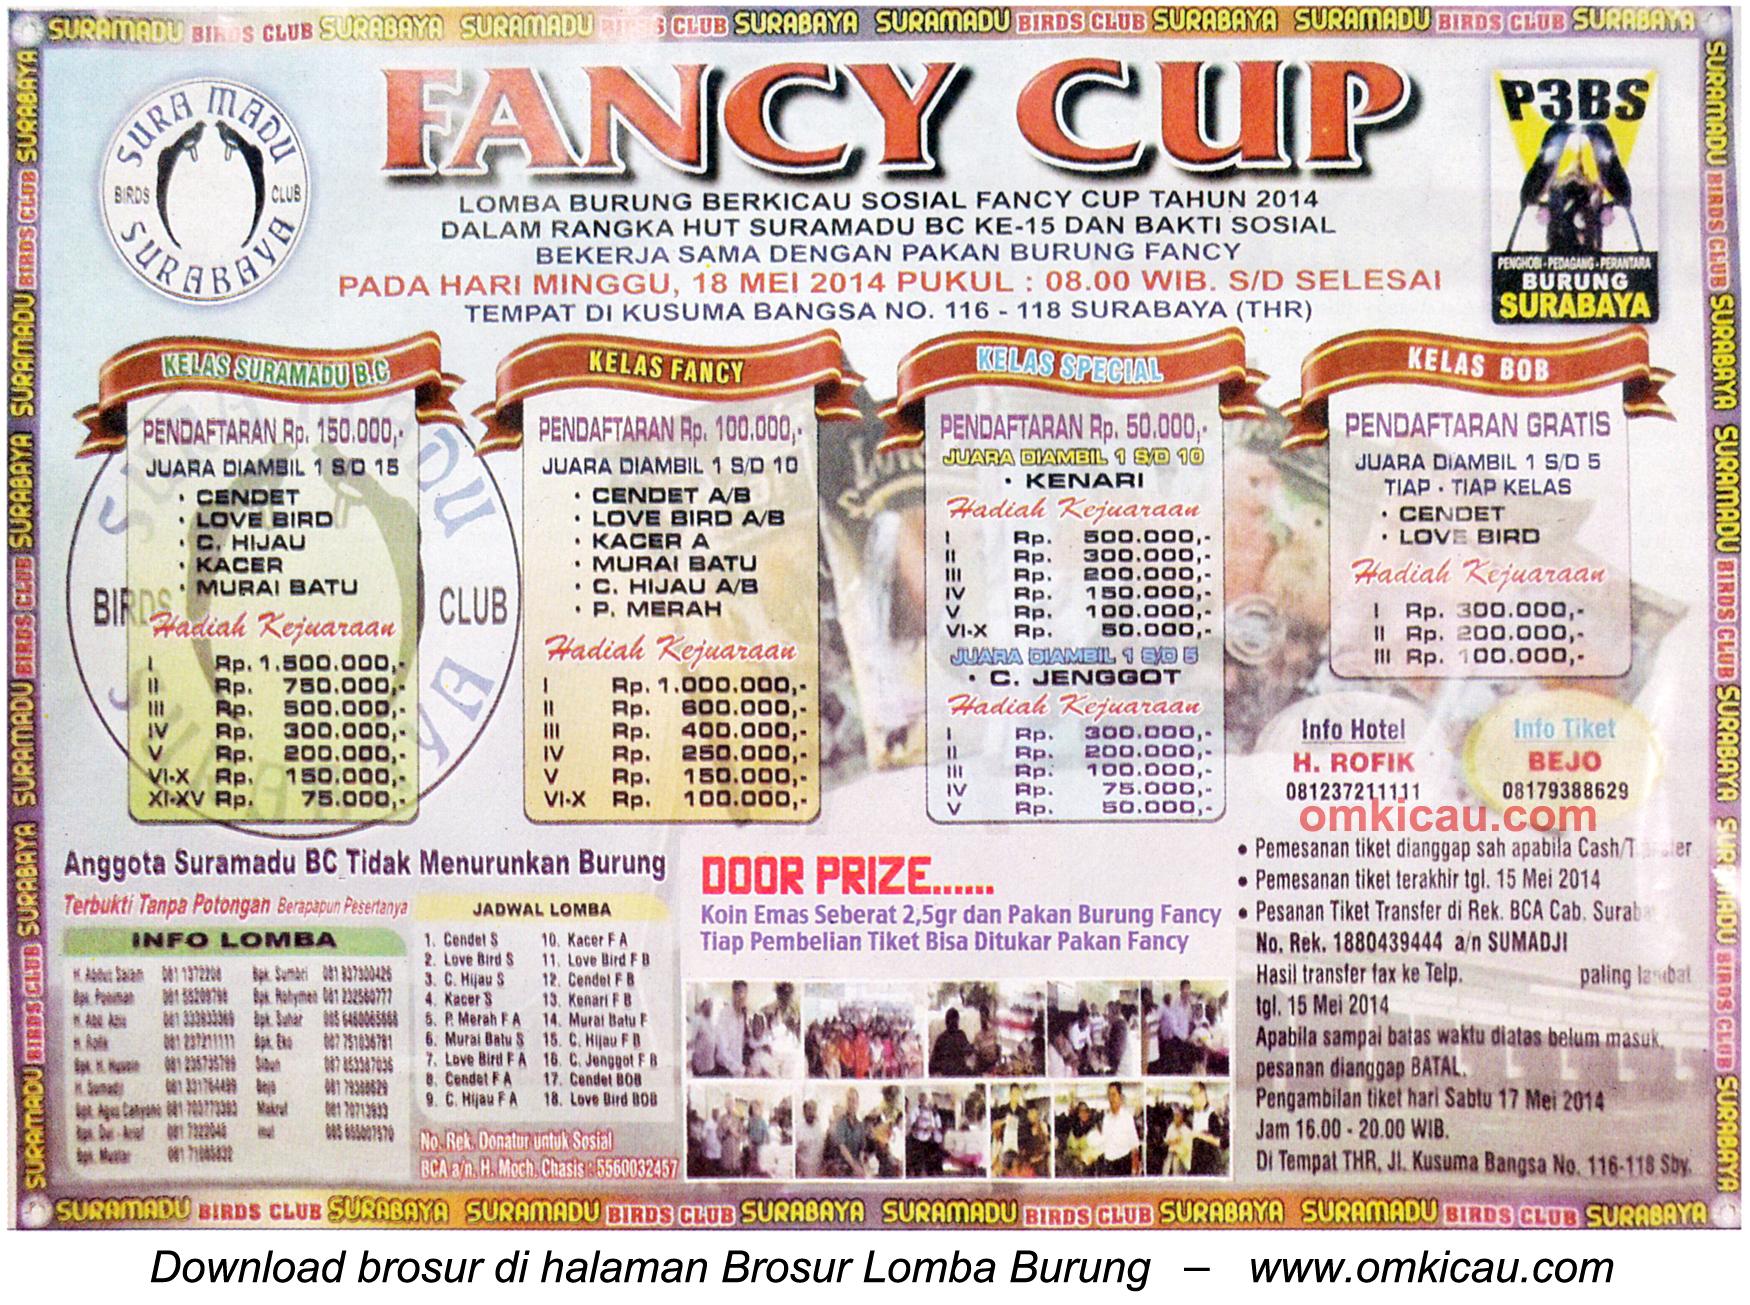 Brosur Lomba Burung Berkicau Fancy Cup, Surabaya, 18 Mei 2014